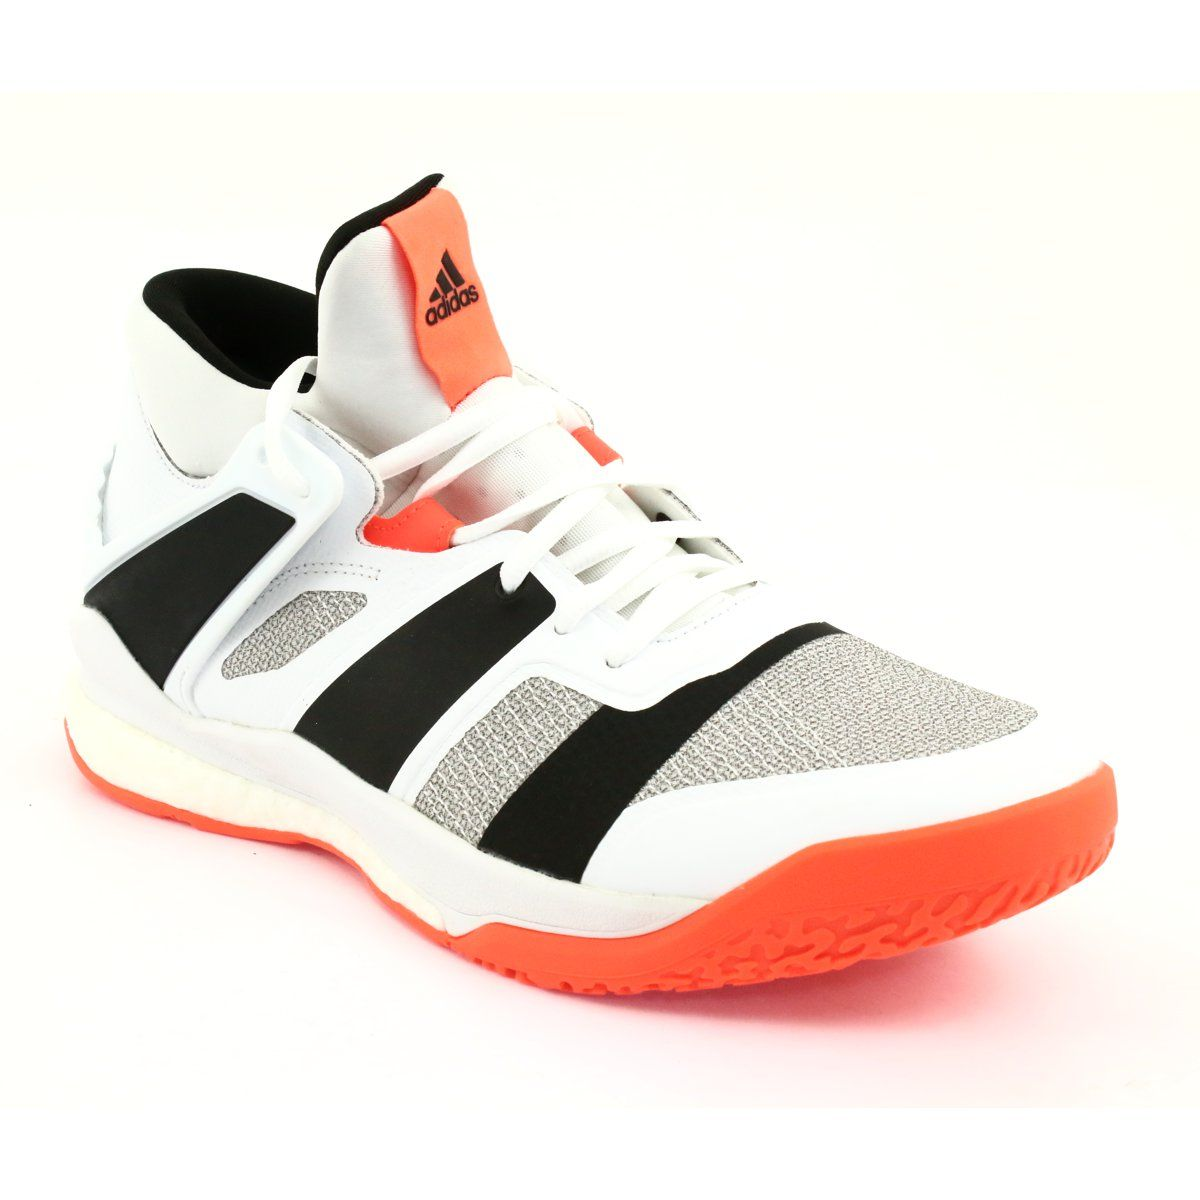 Buty adidas Stabil X Mid M F33827 białe | Shoes, Sneakers